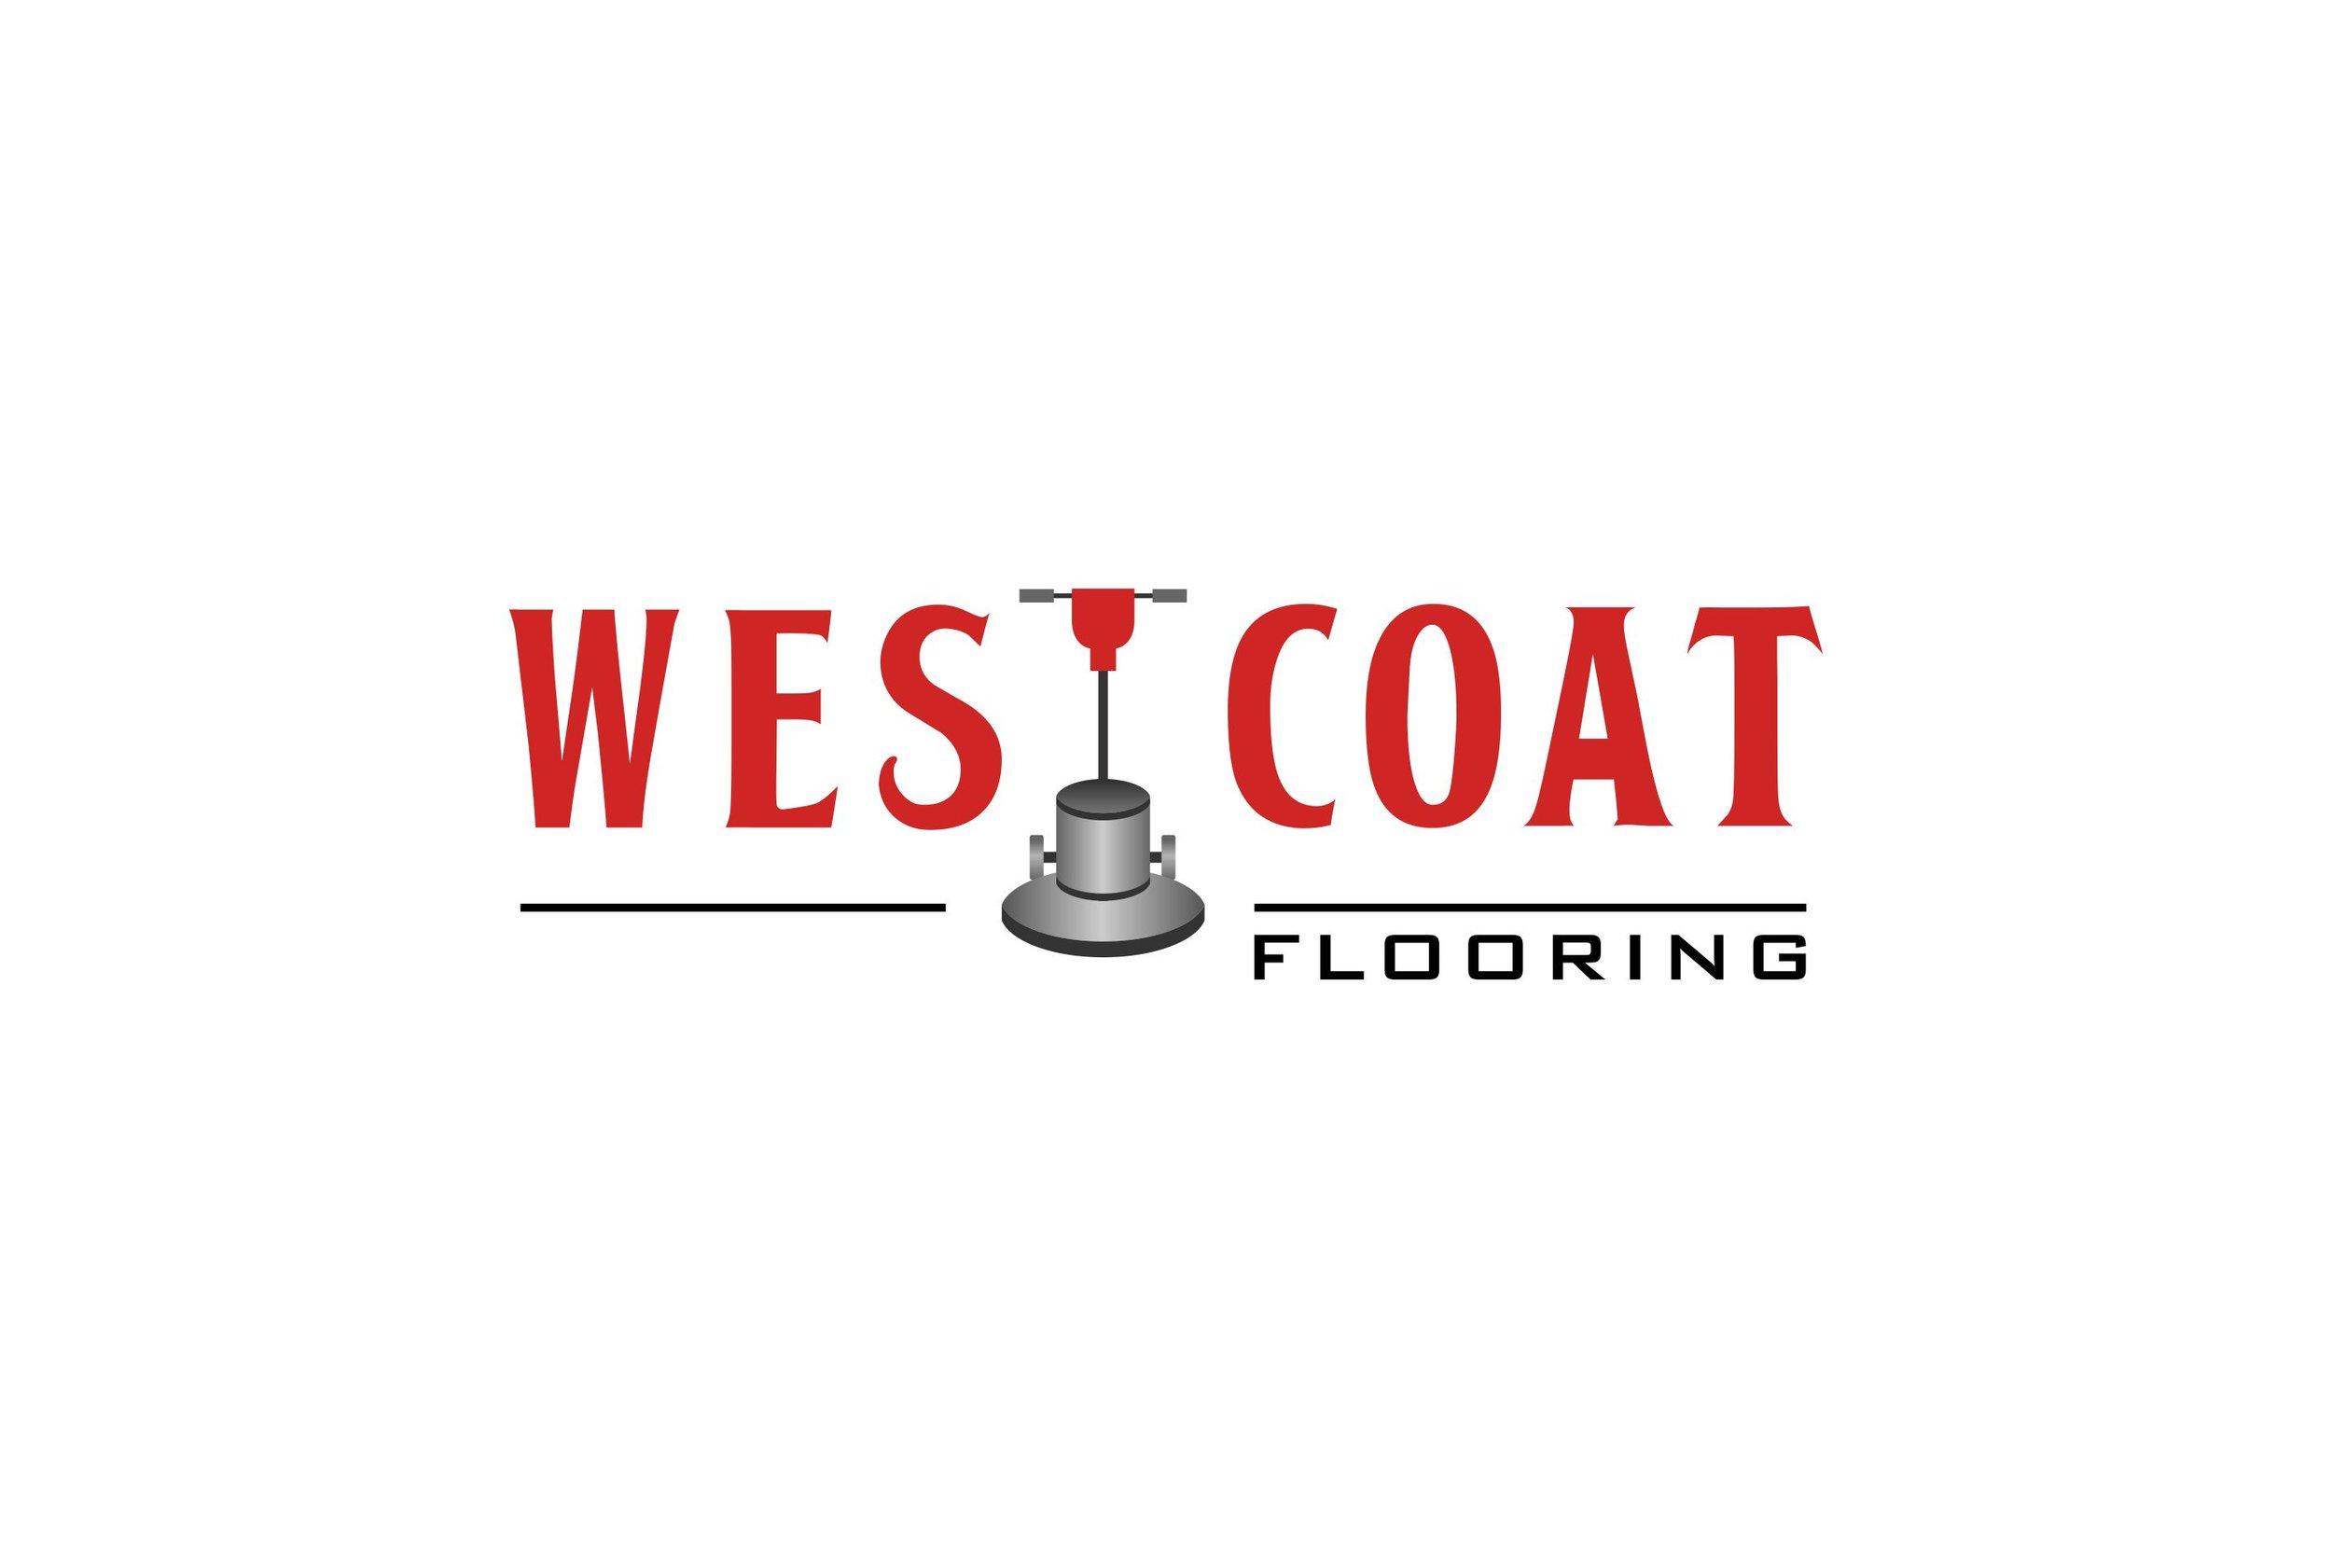 West_Coat_Flooring (3).jpg